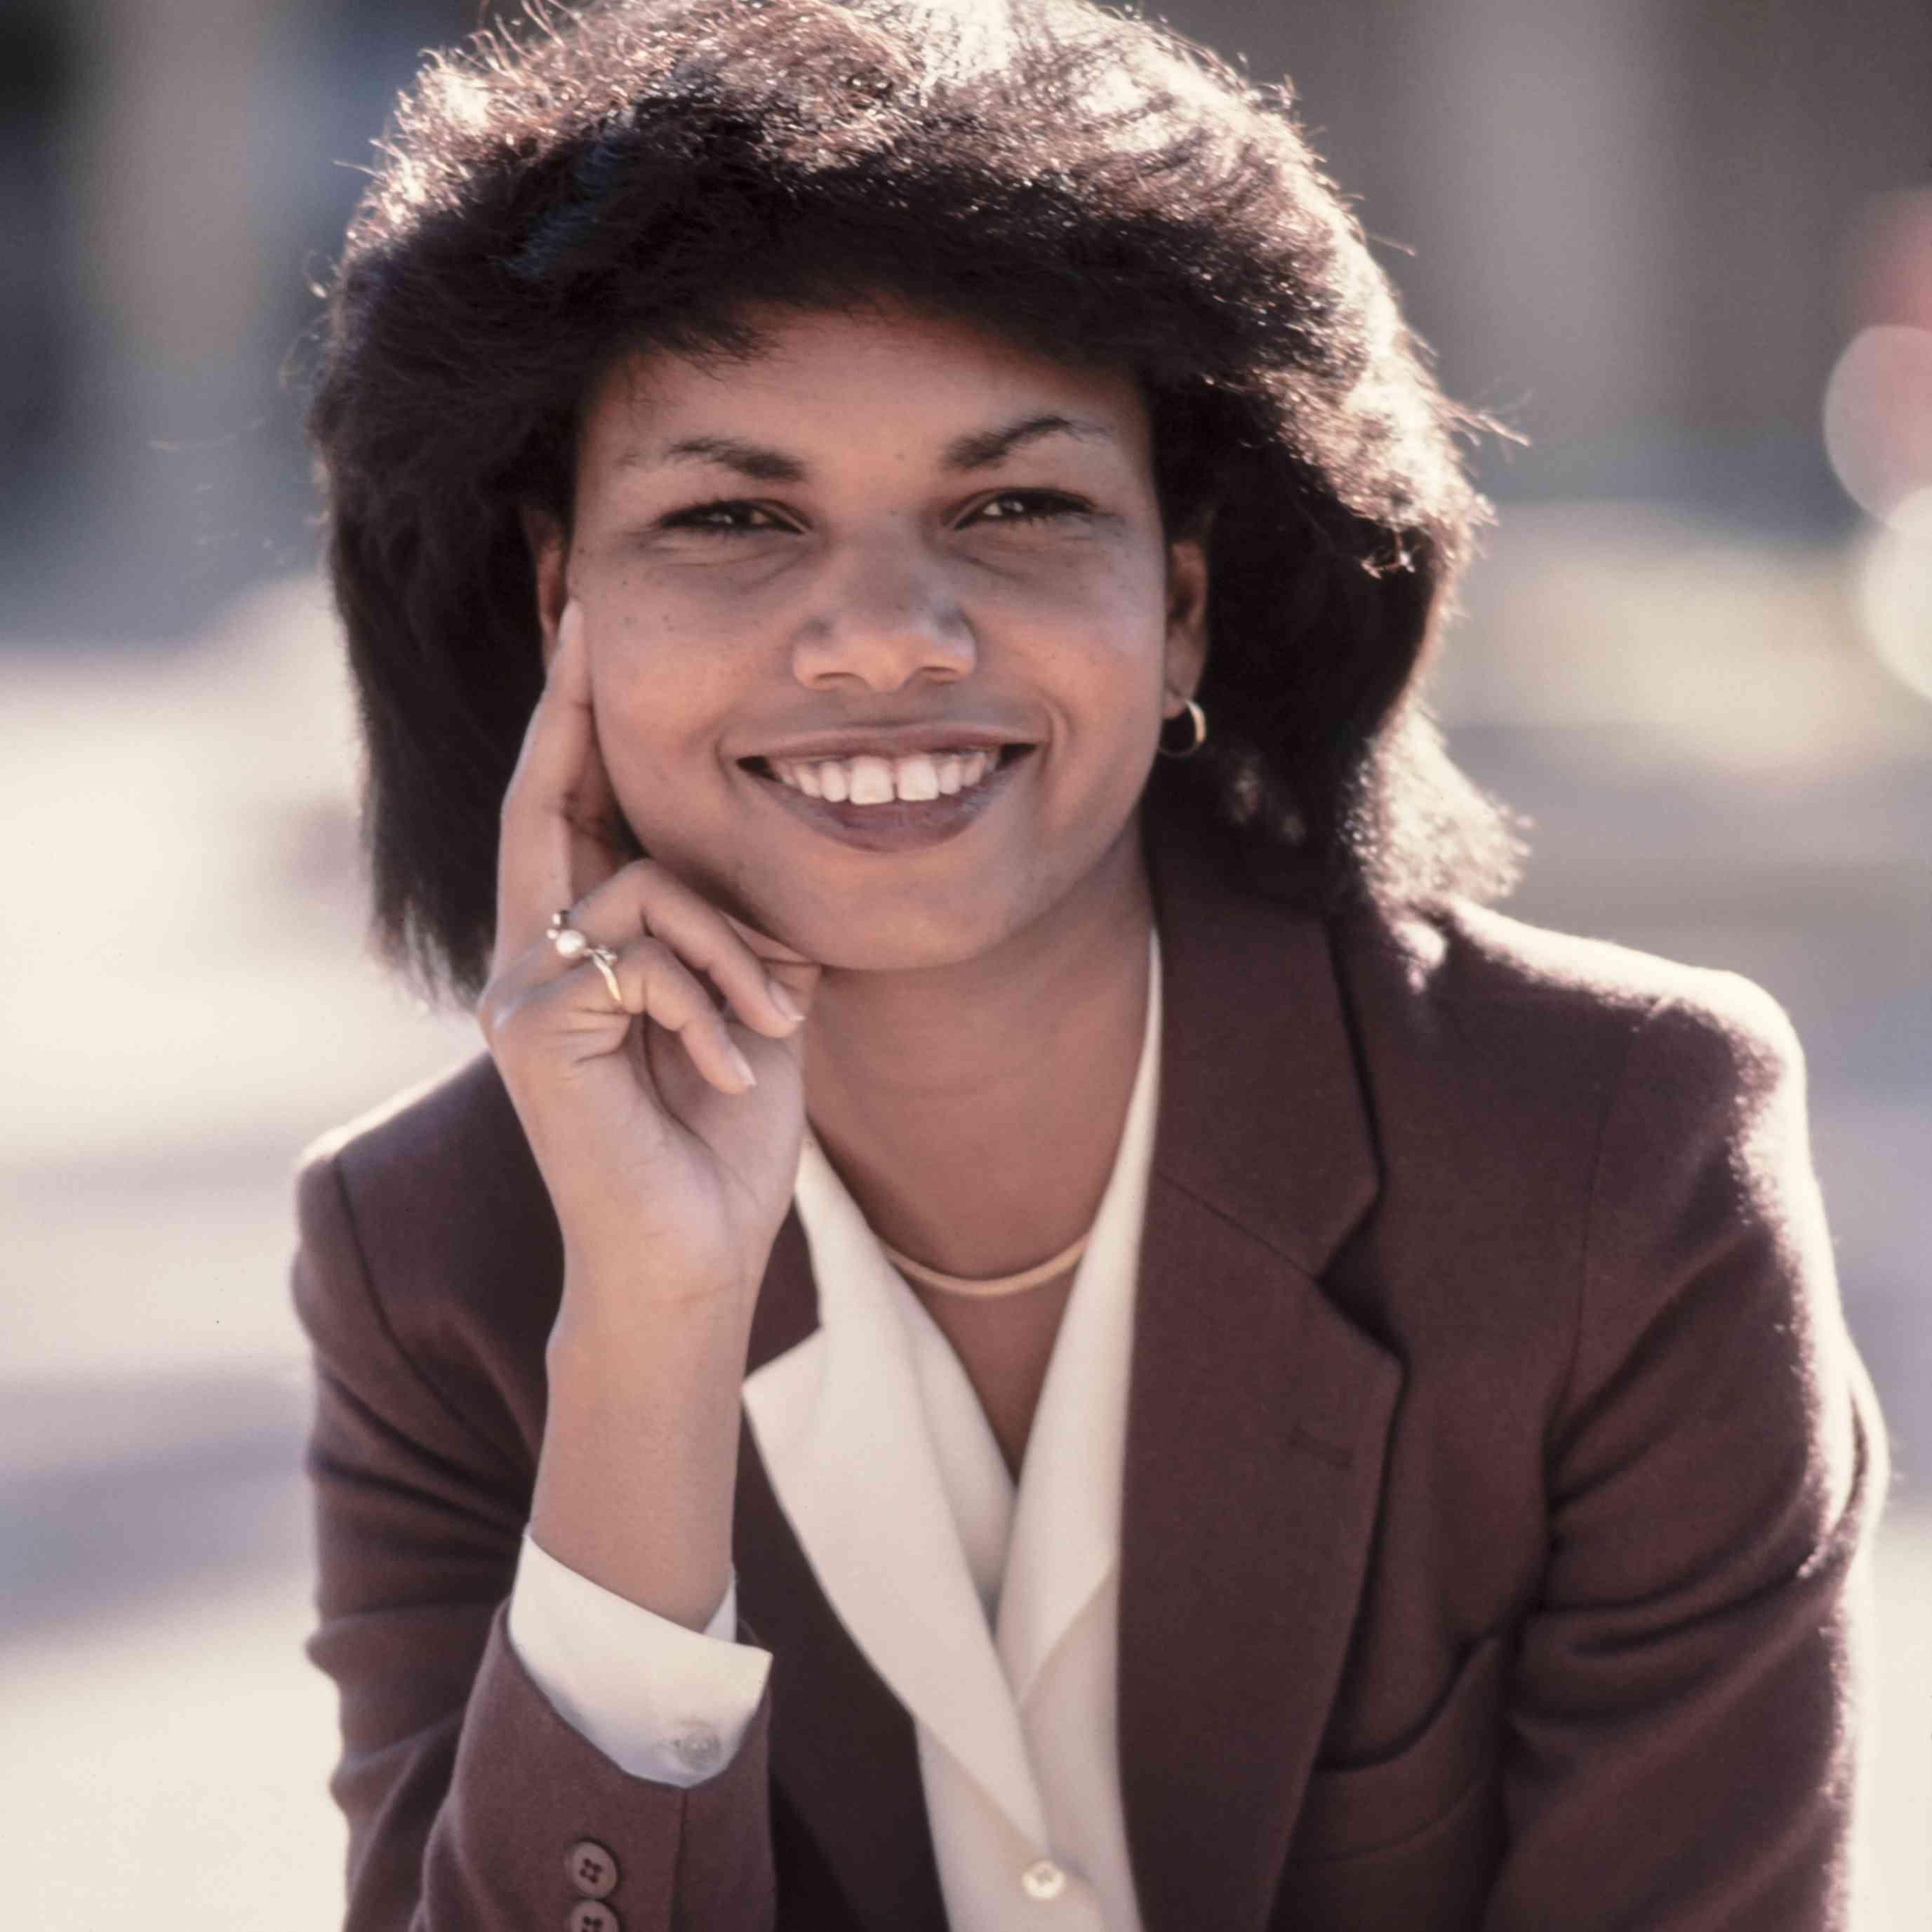 Professor Condoleezza Rice of Stanford University poses for a portrait in November 1985